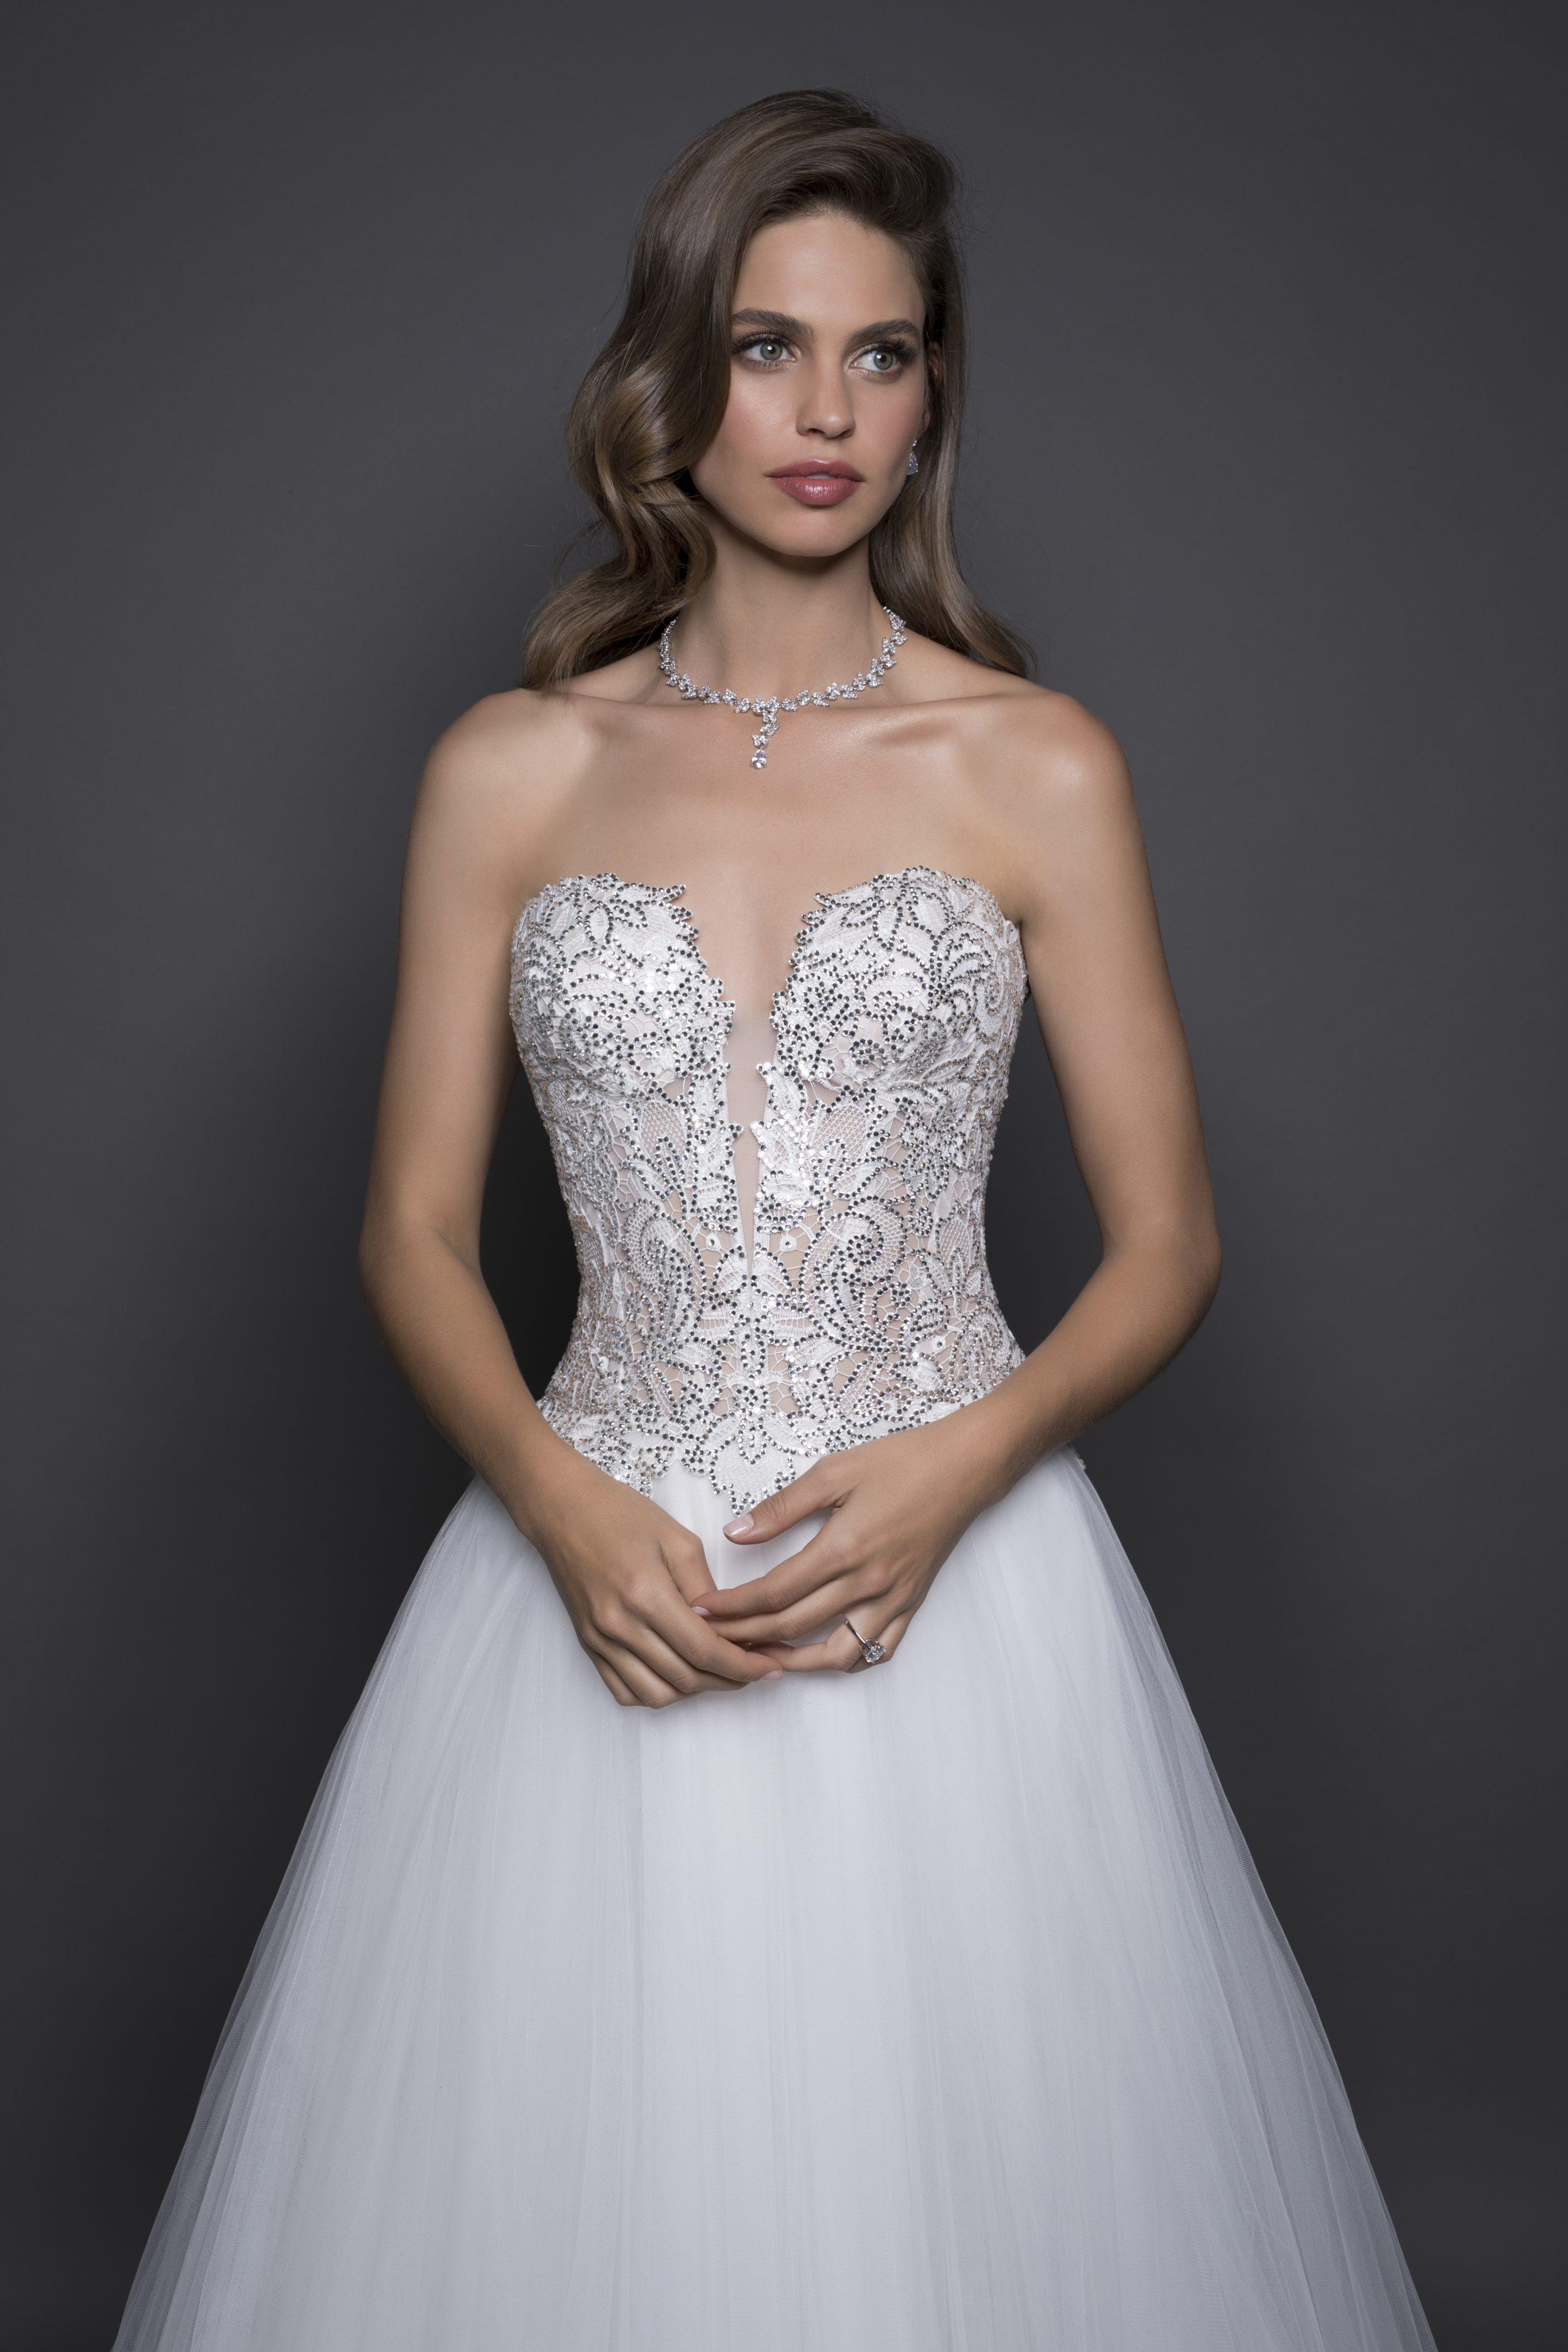 Sophia Moncelli for Kleinfeld Wedding, Cap Sleeve Beaded ...   Kleinfeld Bridal Wedding Dresses